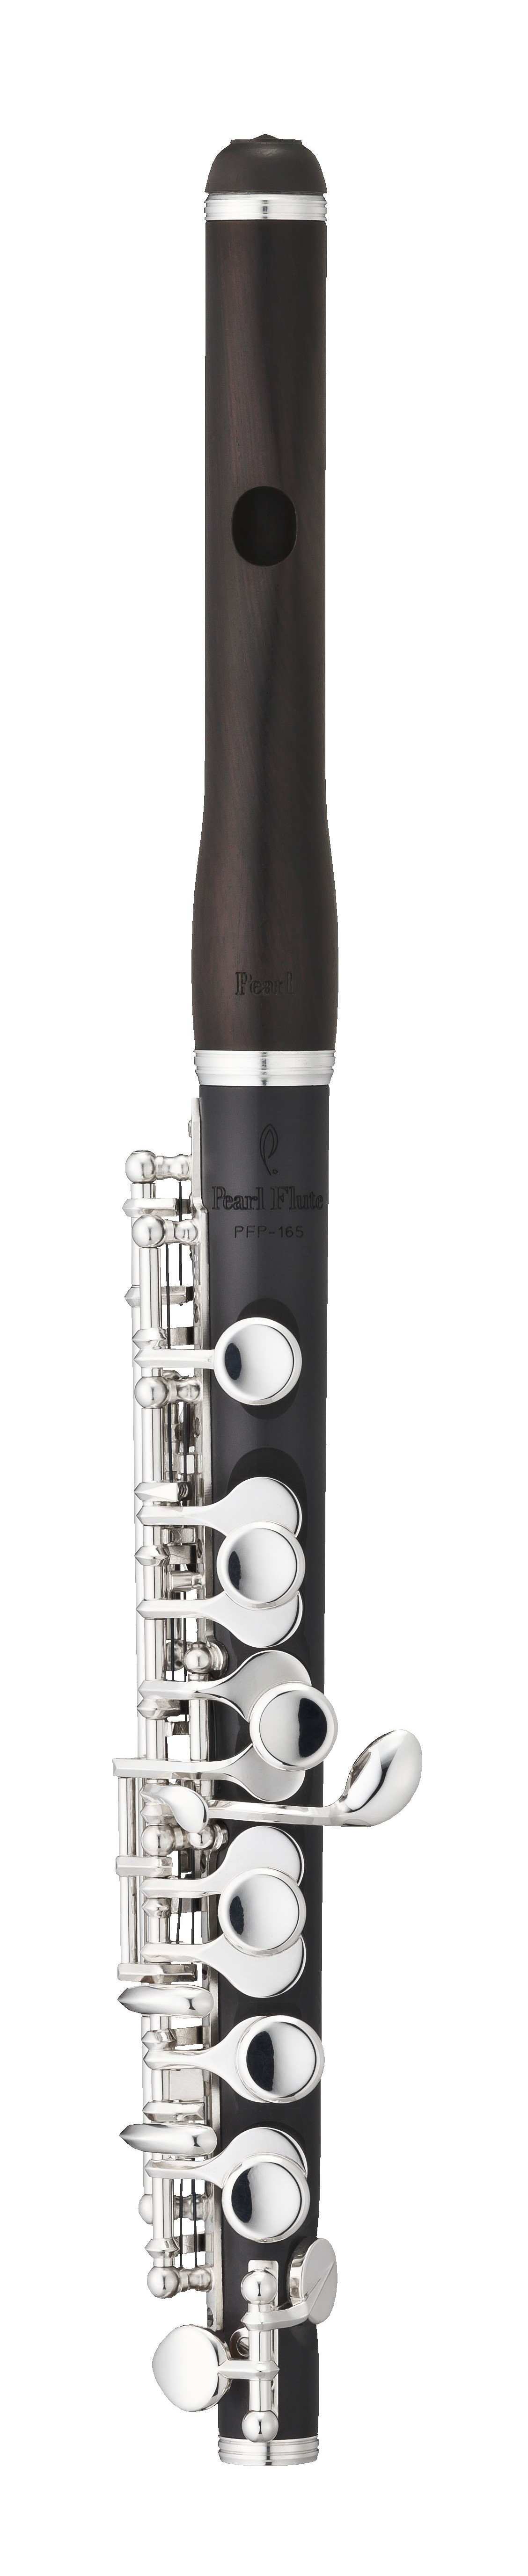 Pearl - 165 - E - HK-HR - Holzblasinstrumente - Piccolo-Flöten | MUSIK BERTRAM Deutschland Freiburg